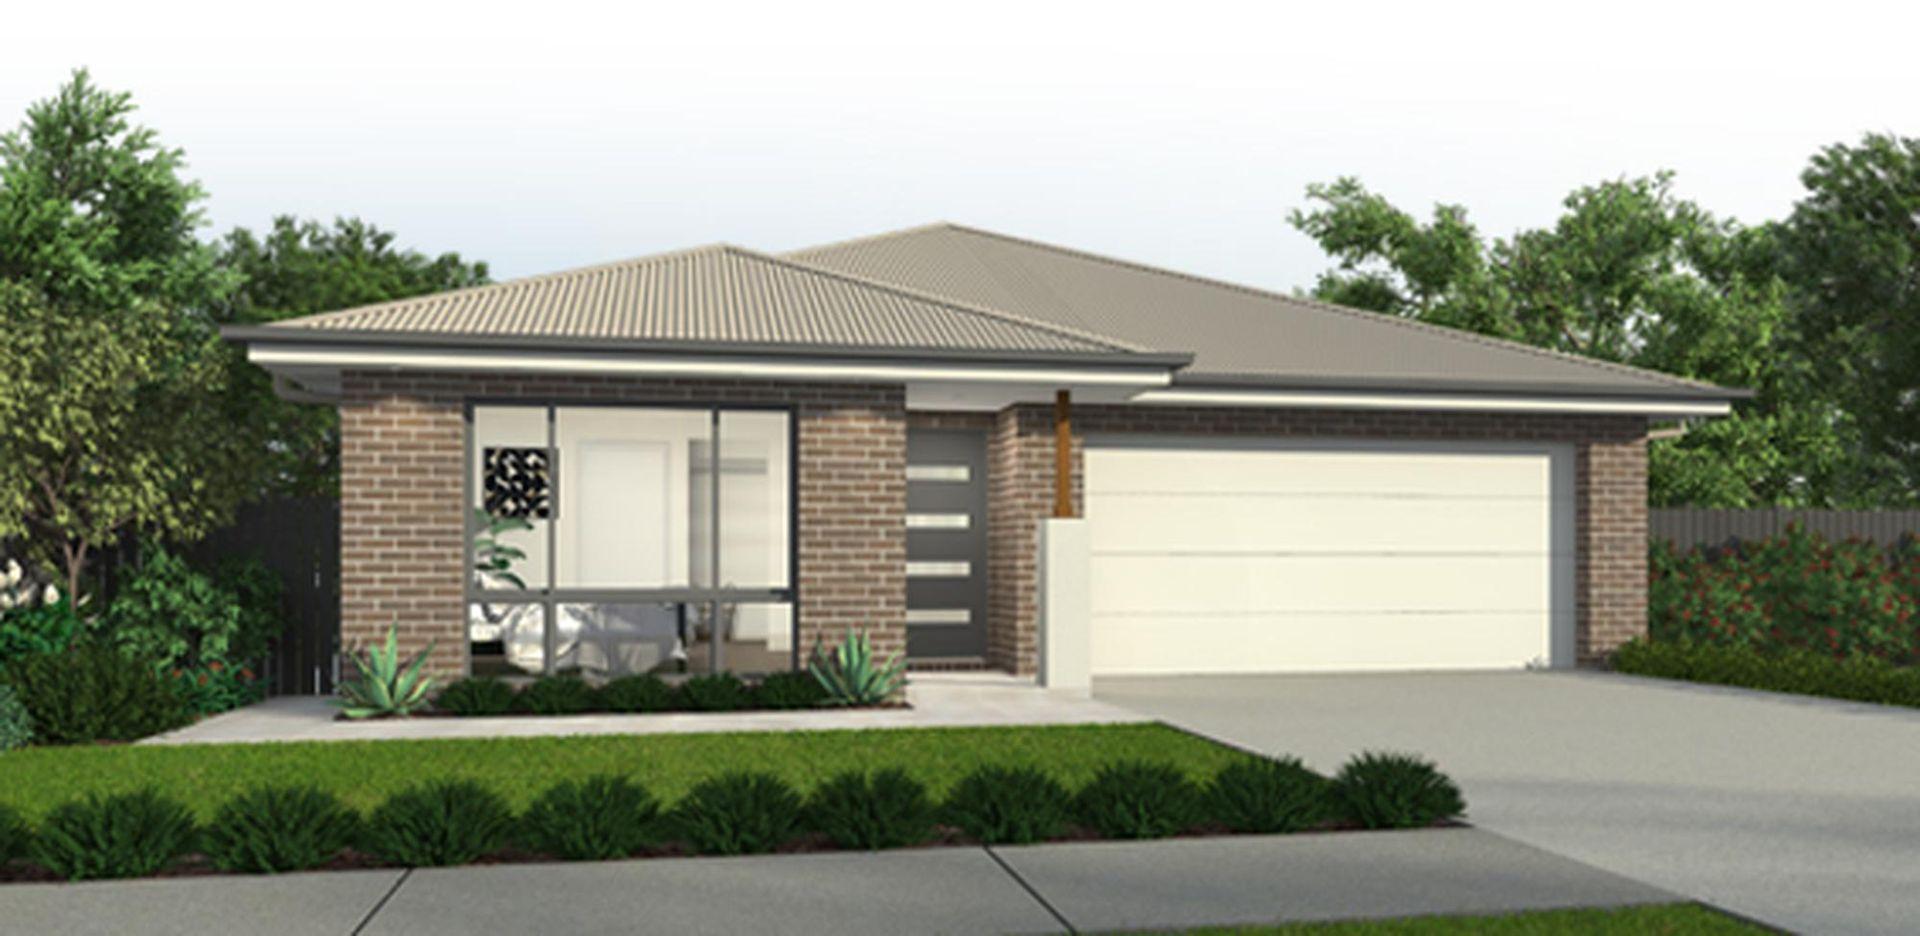 905 The Ruins Way, Port Macquarie NSW 2444, Image 0